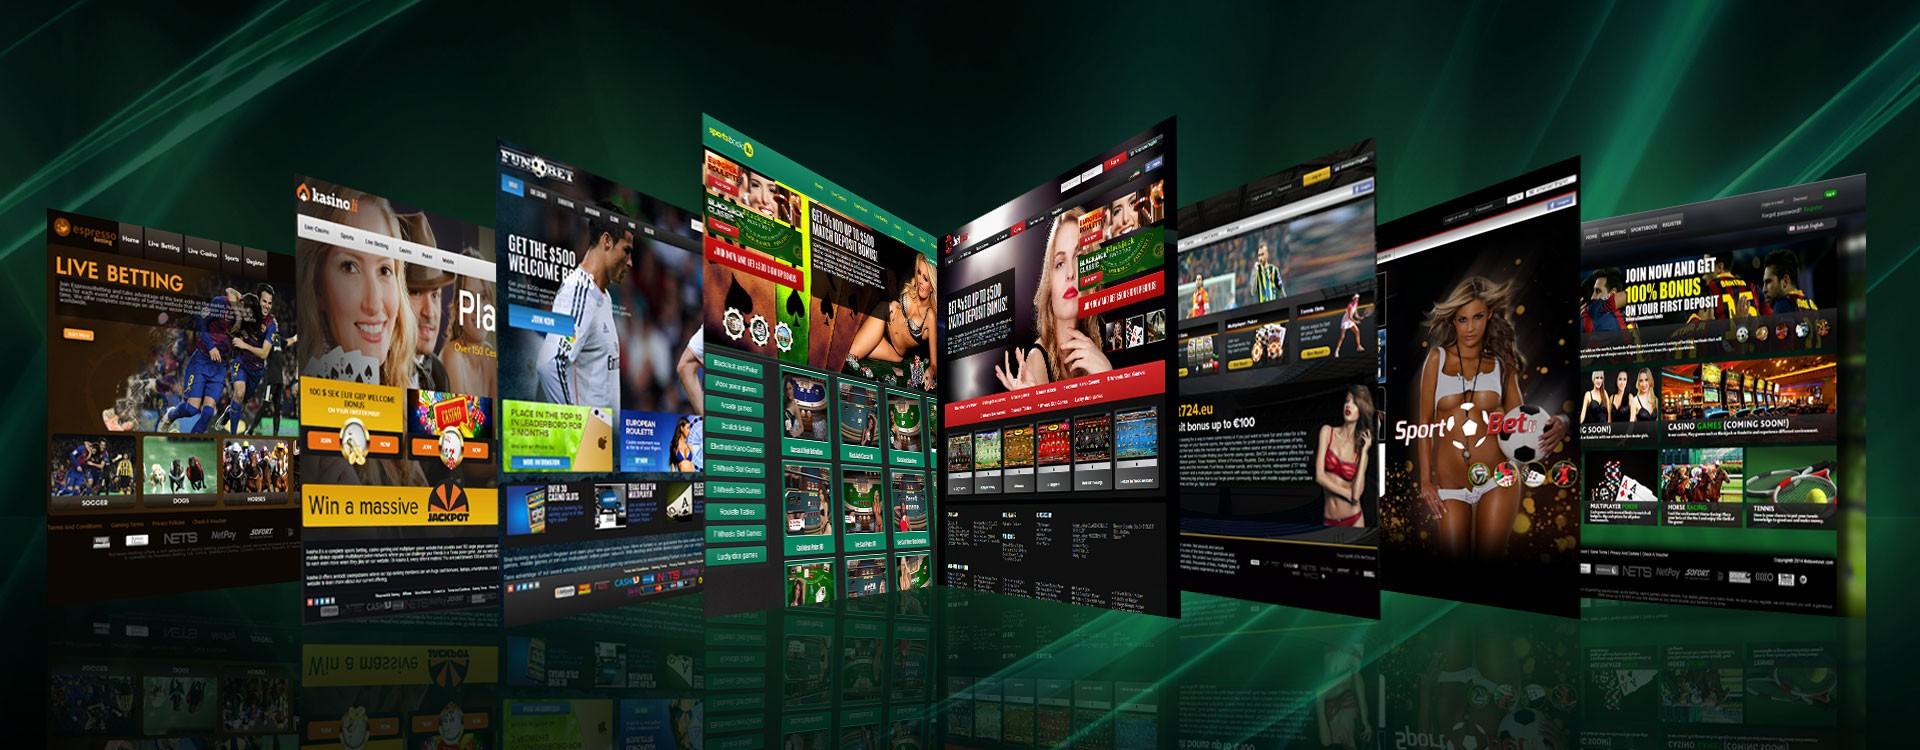 Sports book - online betting gambling basel casino slot